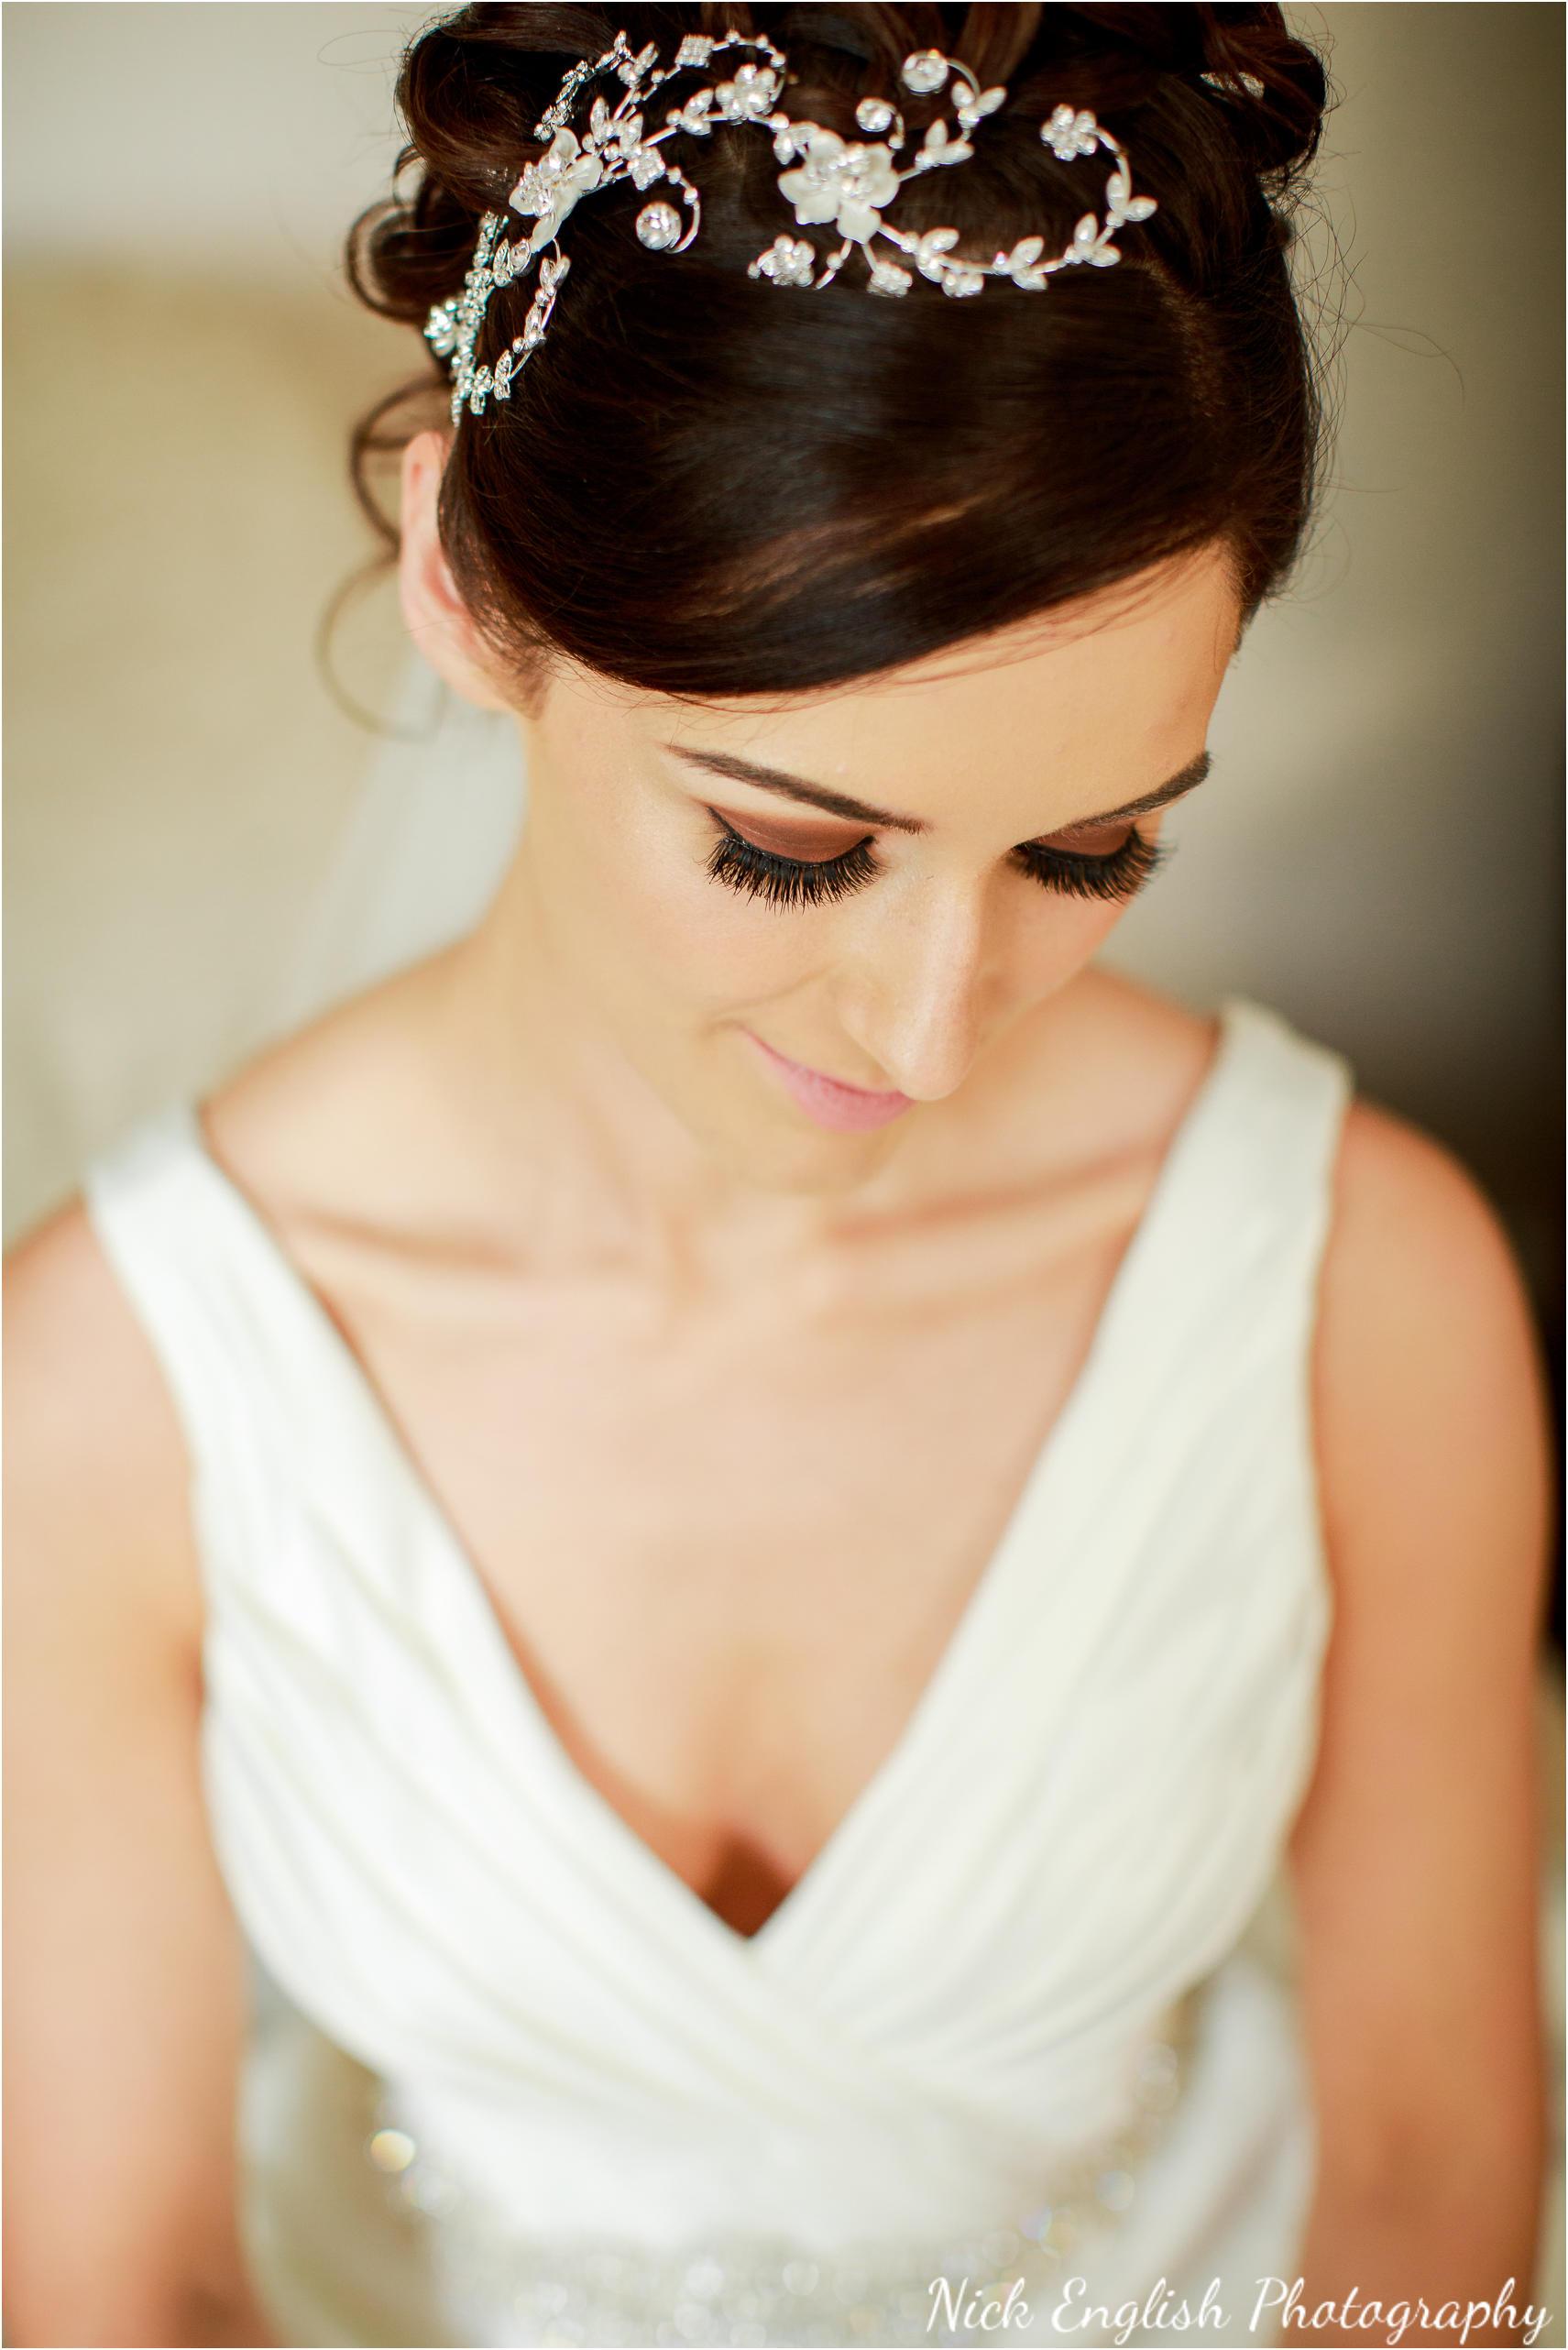 Emily David Wedding Photographs at Barton Grange Preston by Nick English Photography 33jpg.jpeg